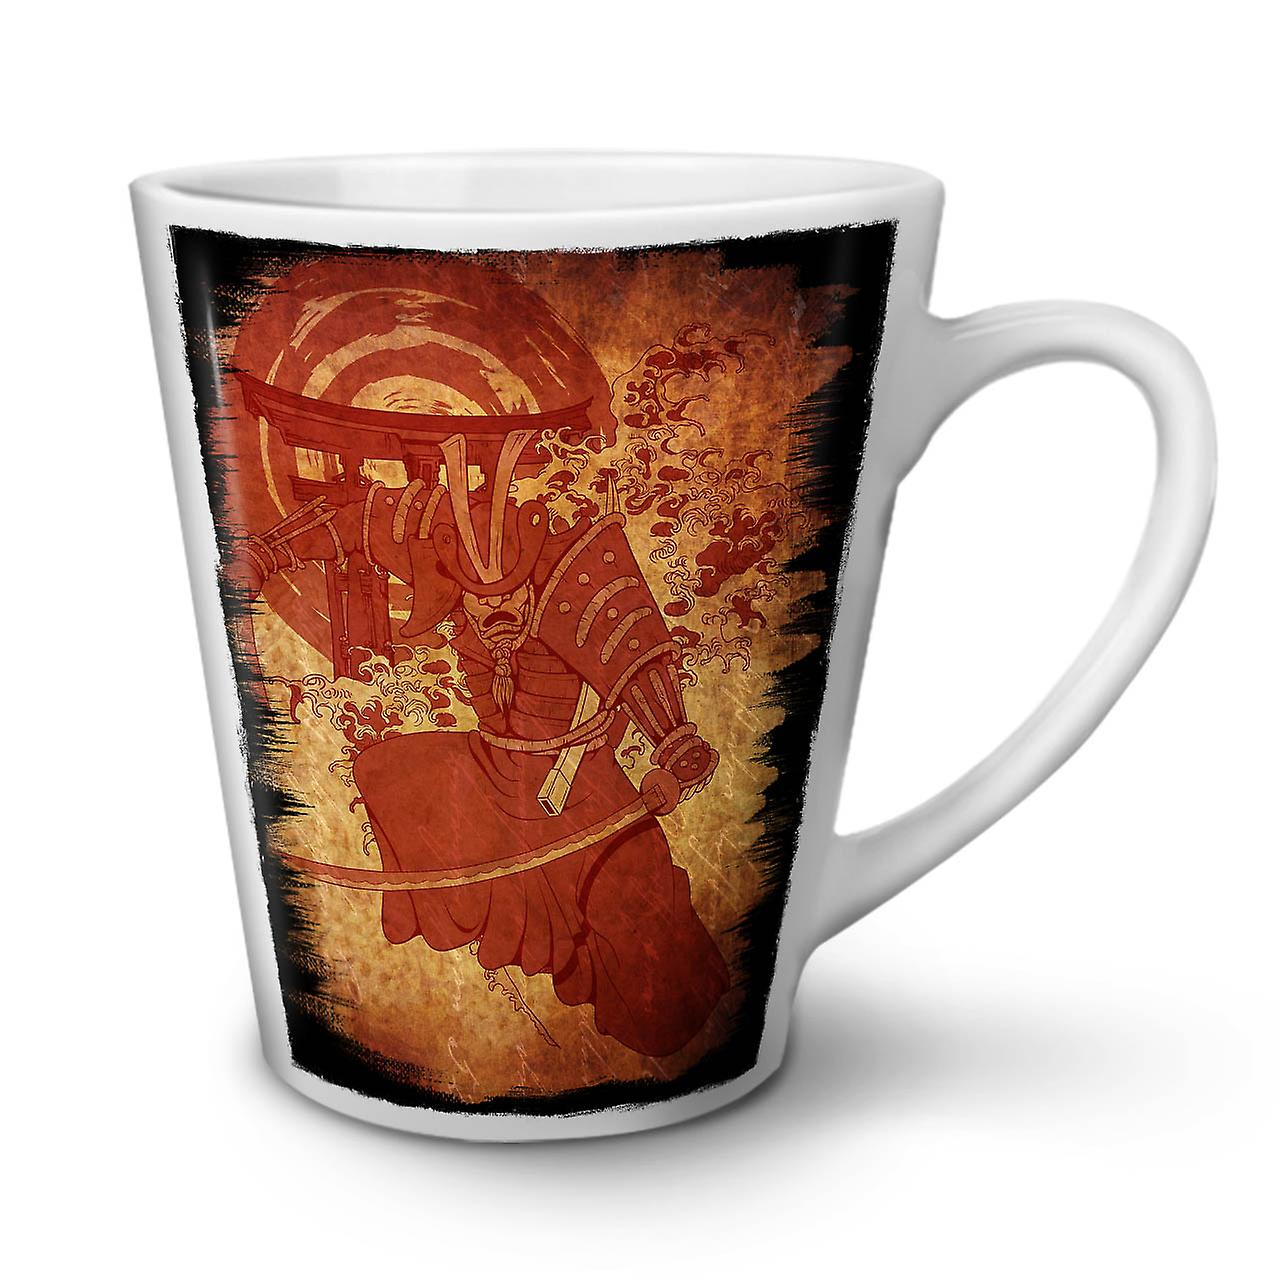 Vintage Blanche Tasse Céramique Fantasy Nouvelle Café Latte 12 Warrior OzWellcoda En OukPXZi